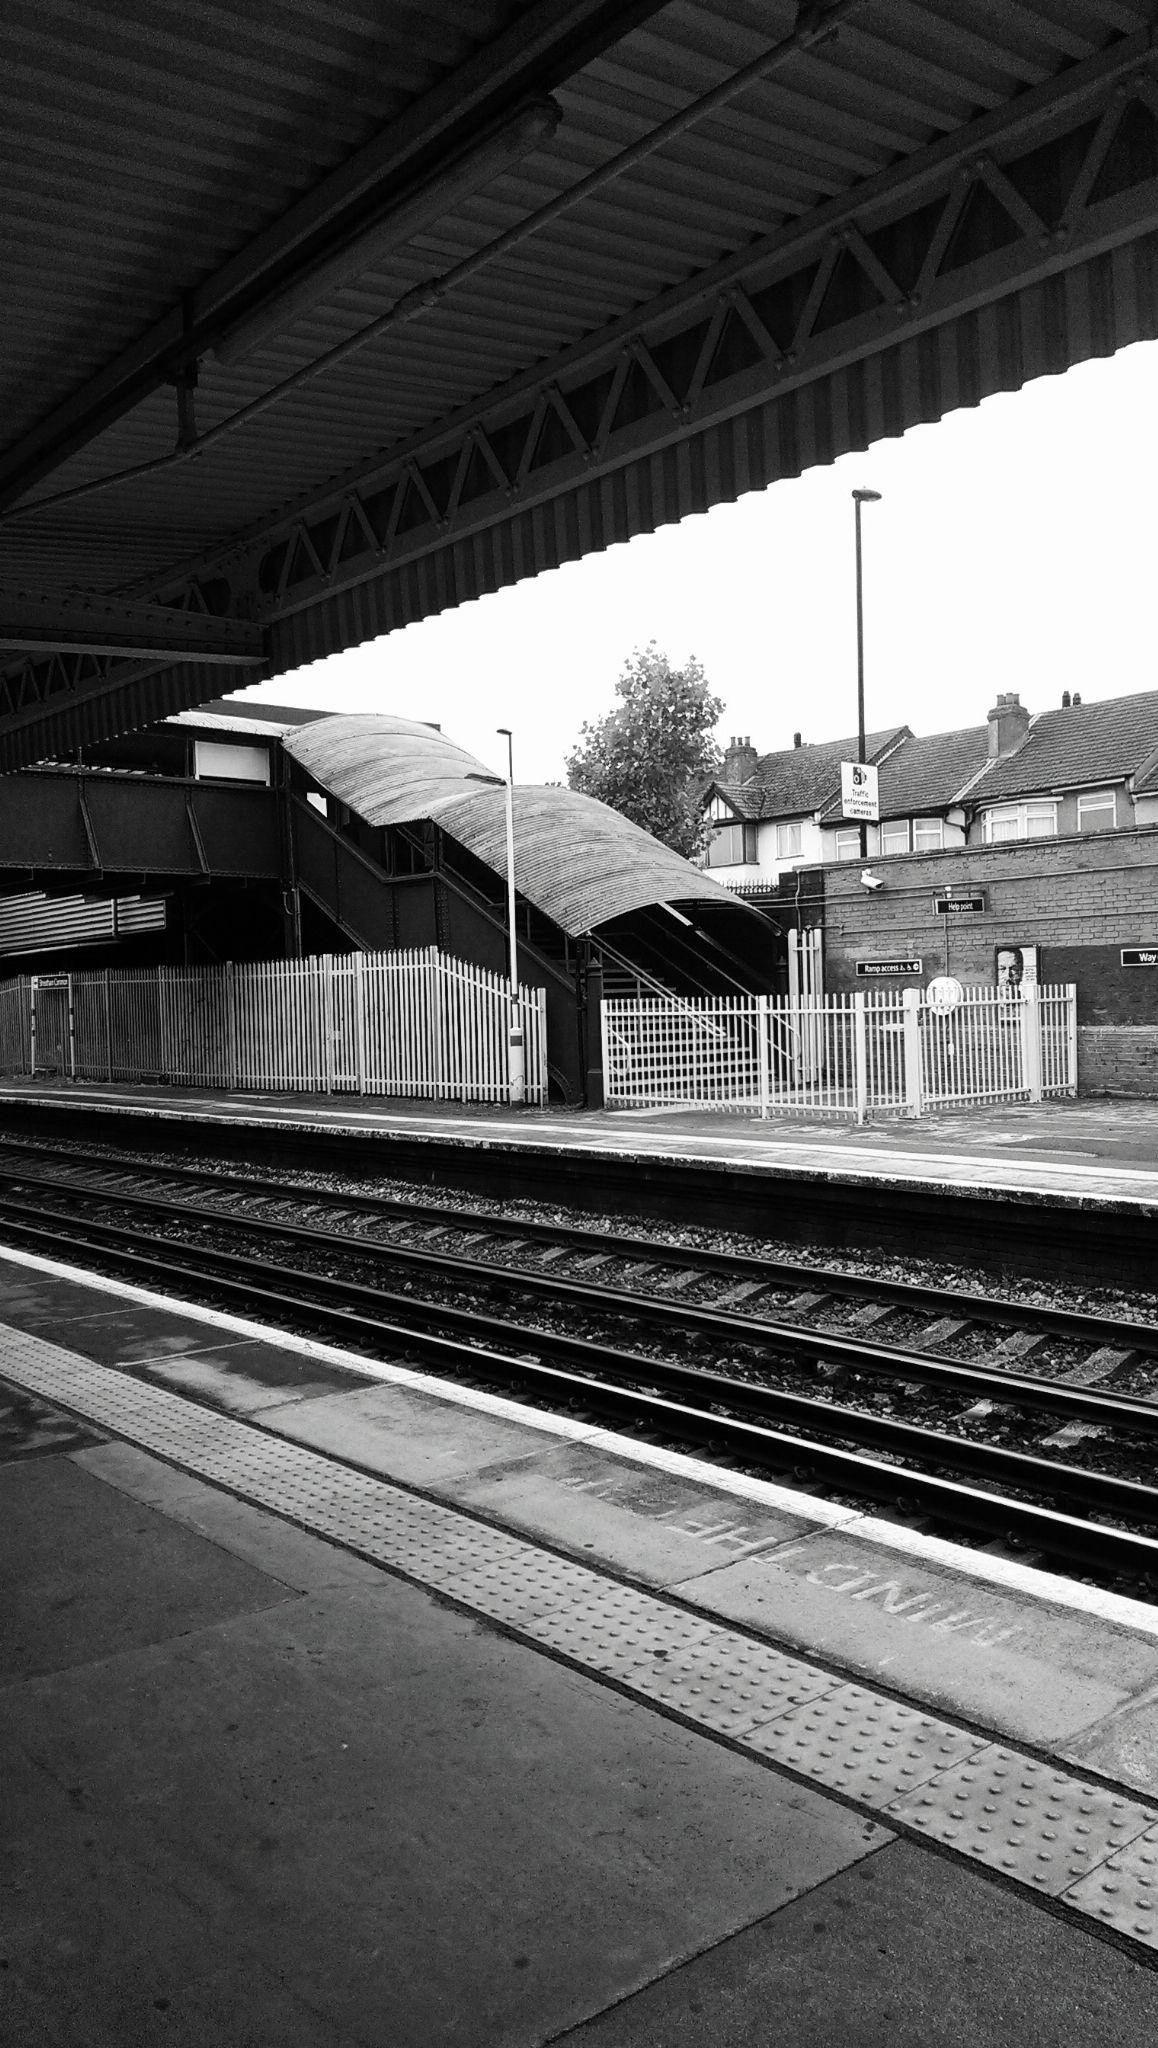 Streatham Common Station by OykaZsawok